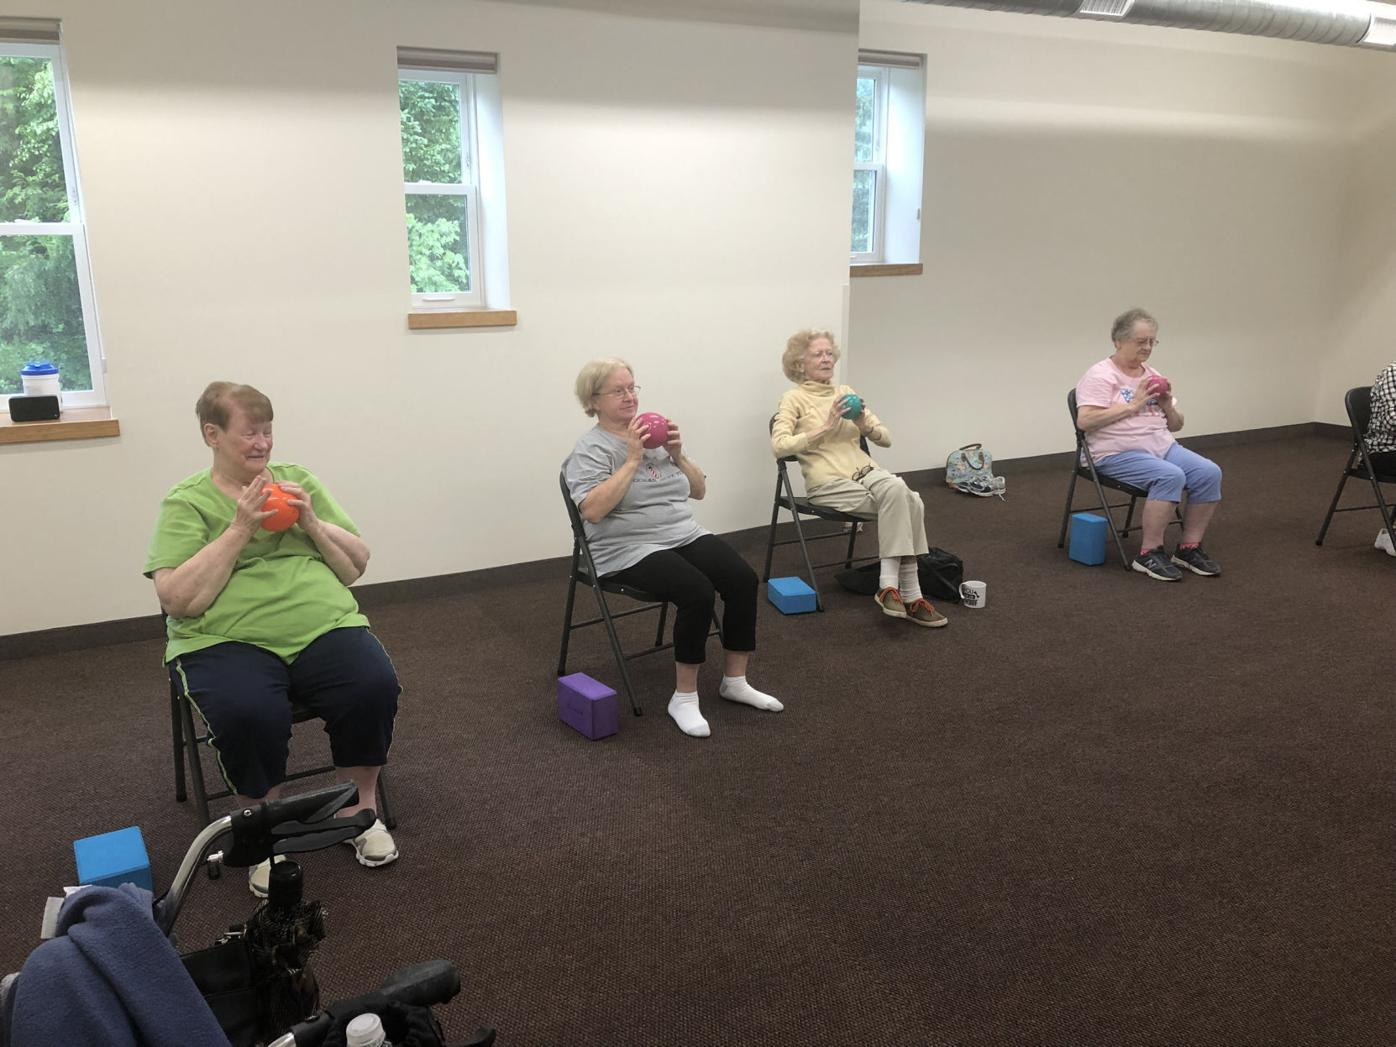 Serving seniors: Carbondale center offers diverse programs for the over-60 set